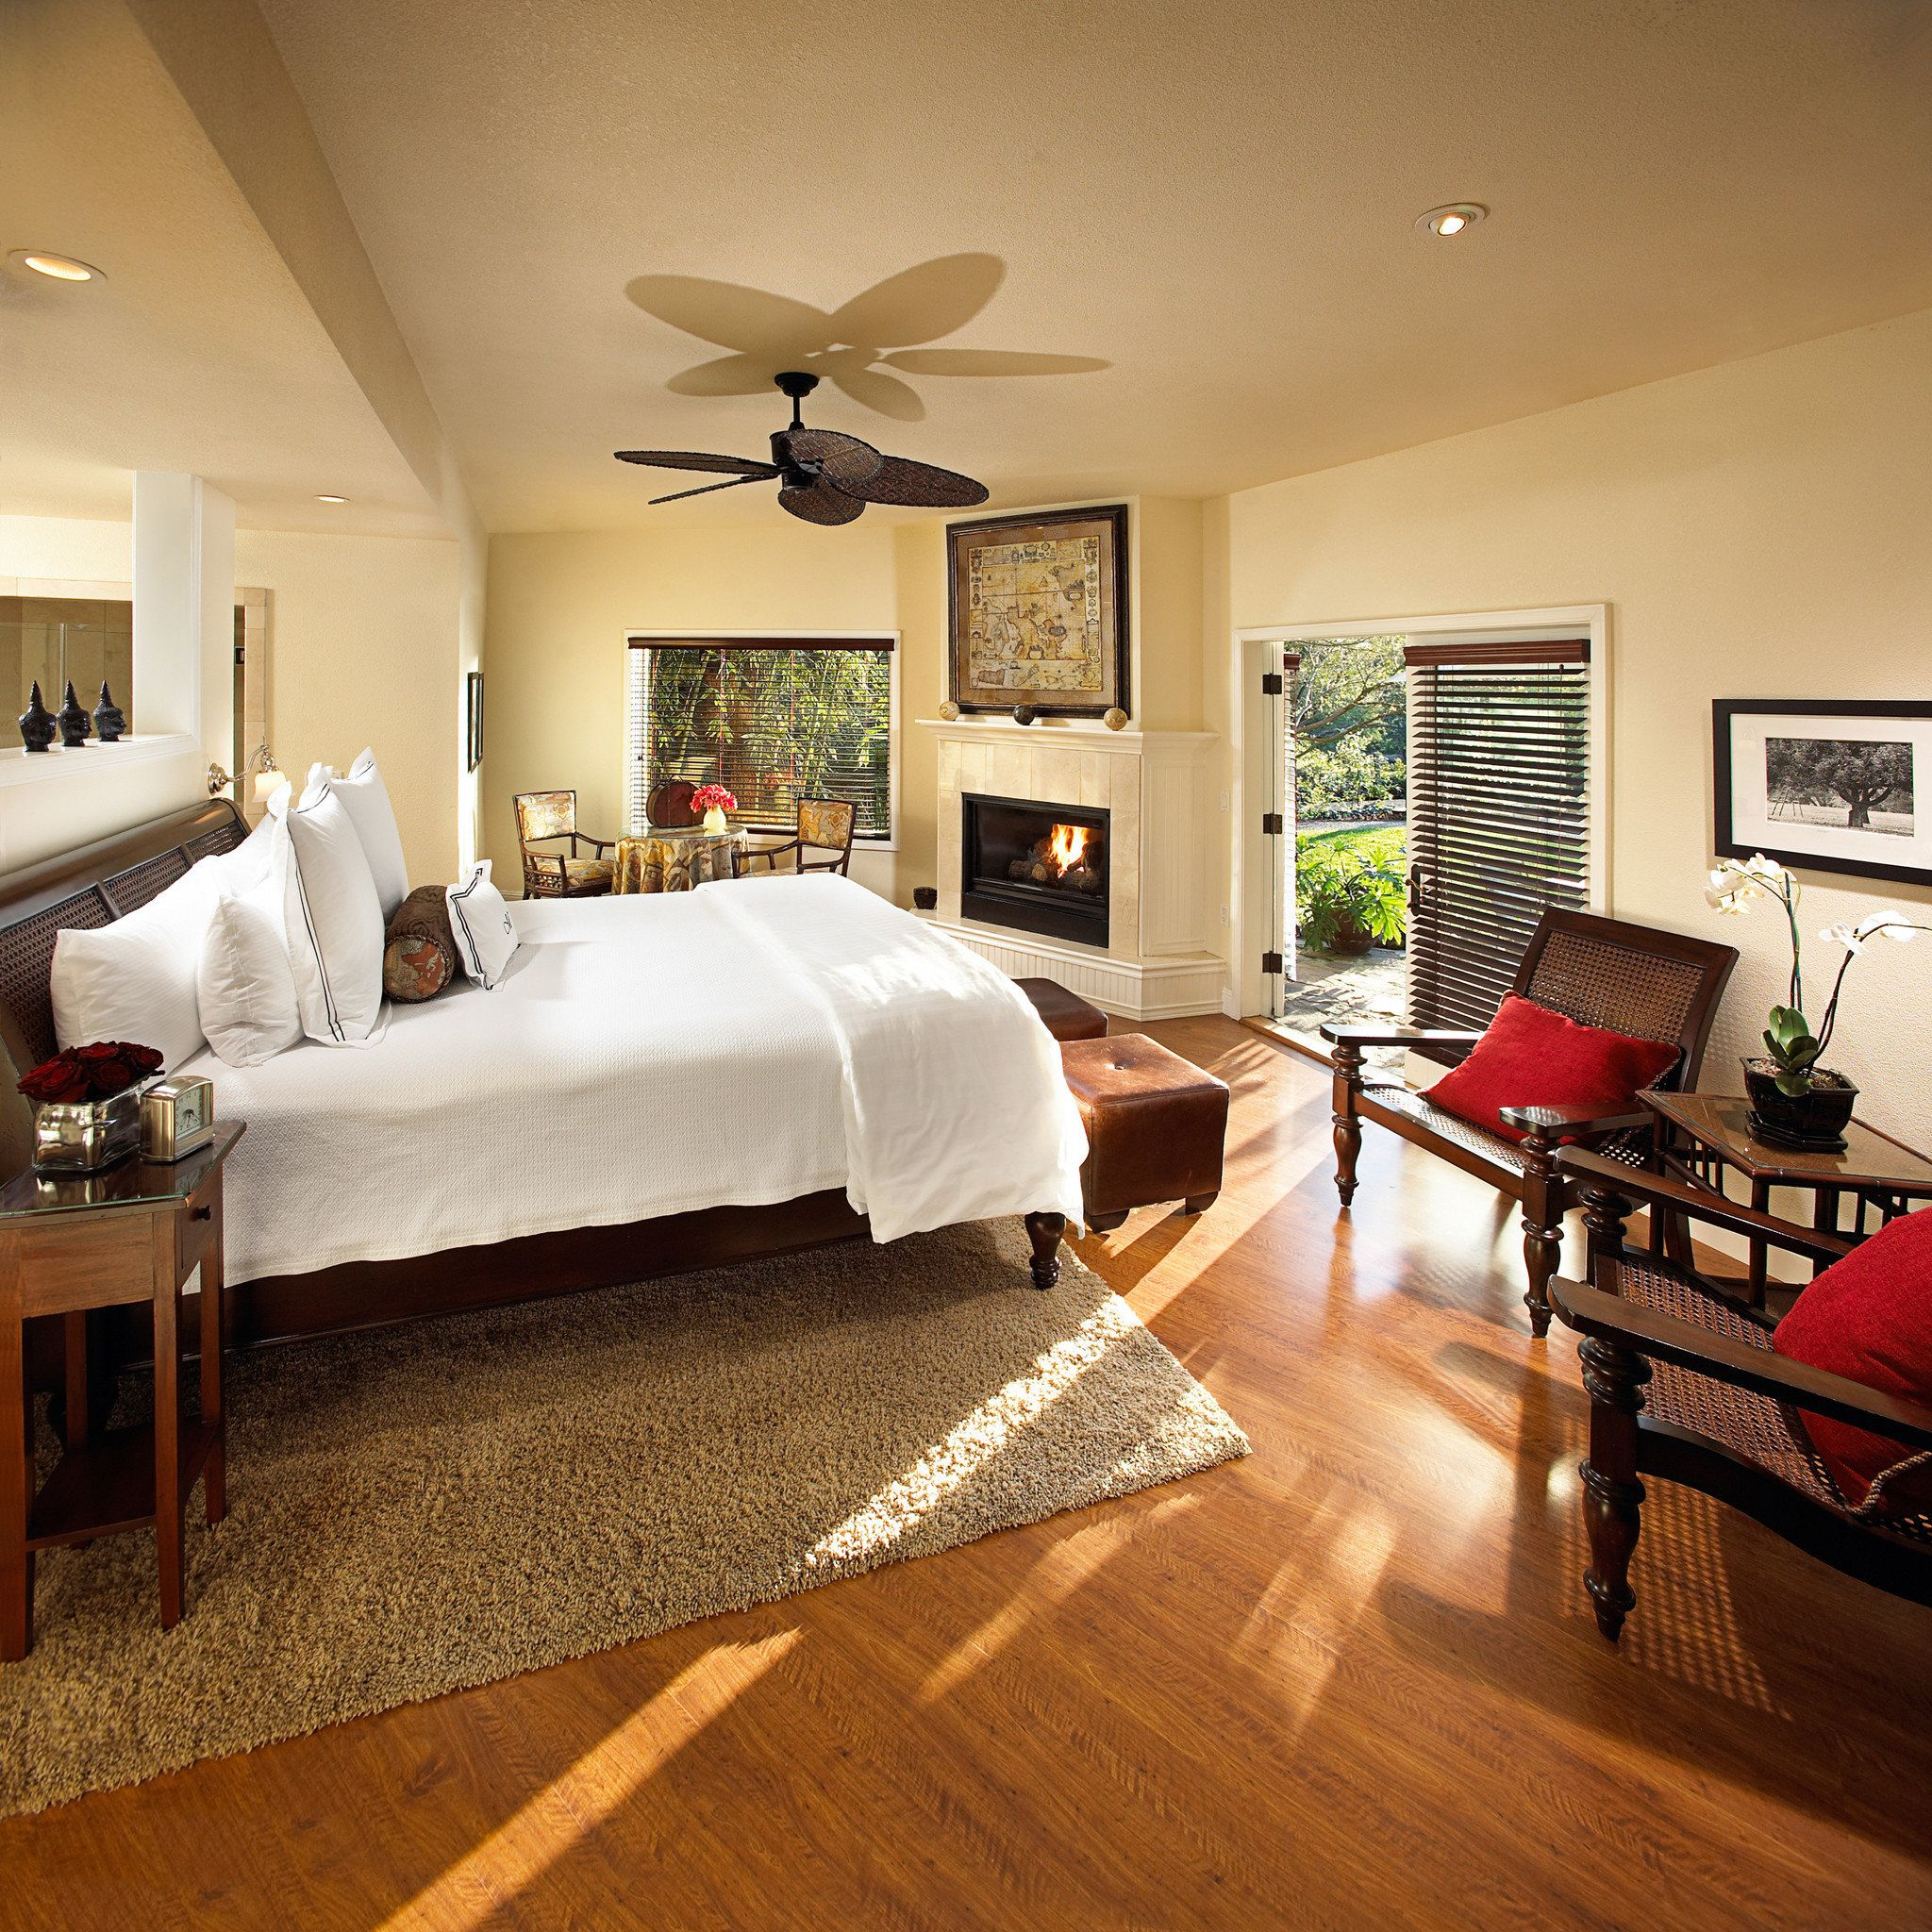 Milliken Creek Inn & Spa (Napa Valley, CA Hotels in napa